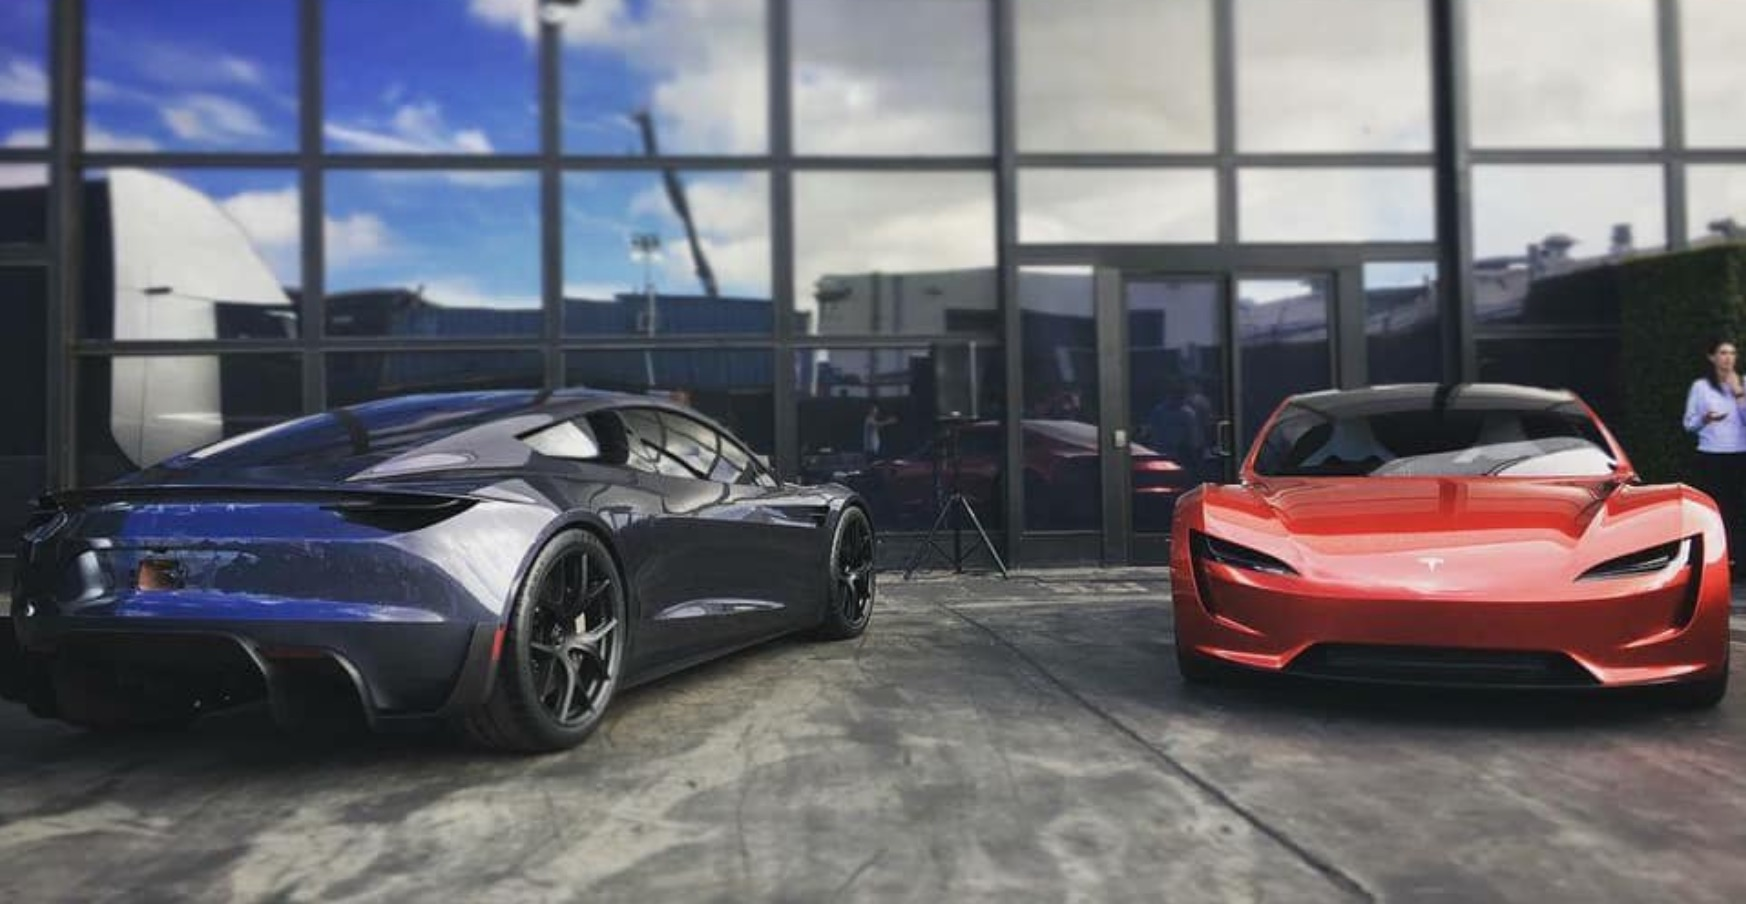 Tesla Roadster hero jpg?quality=82&strip=all.'